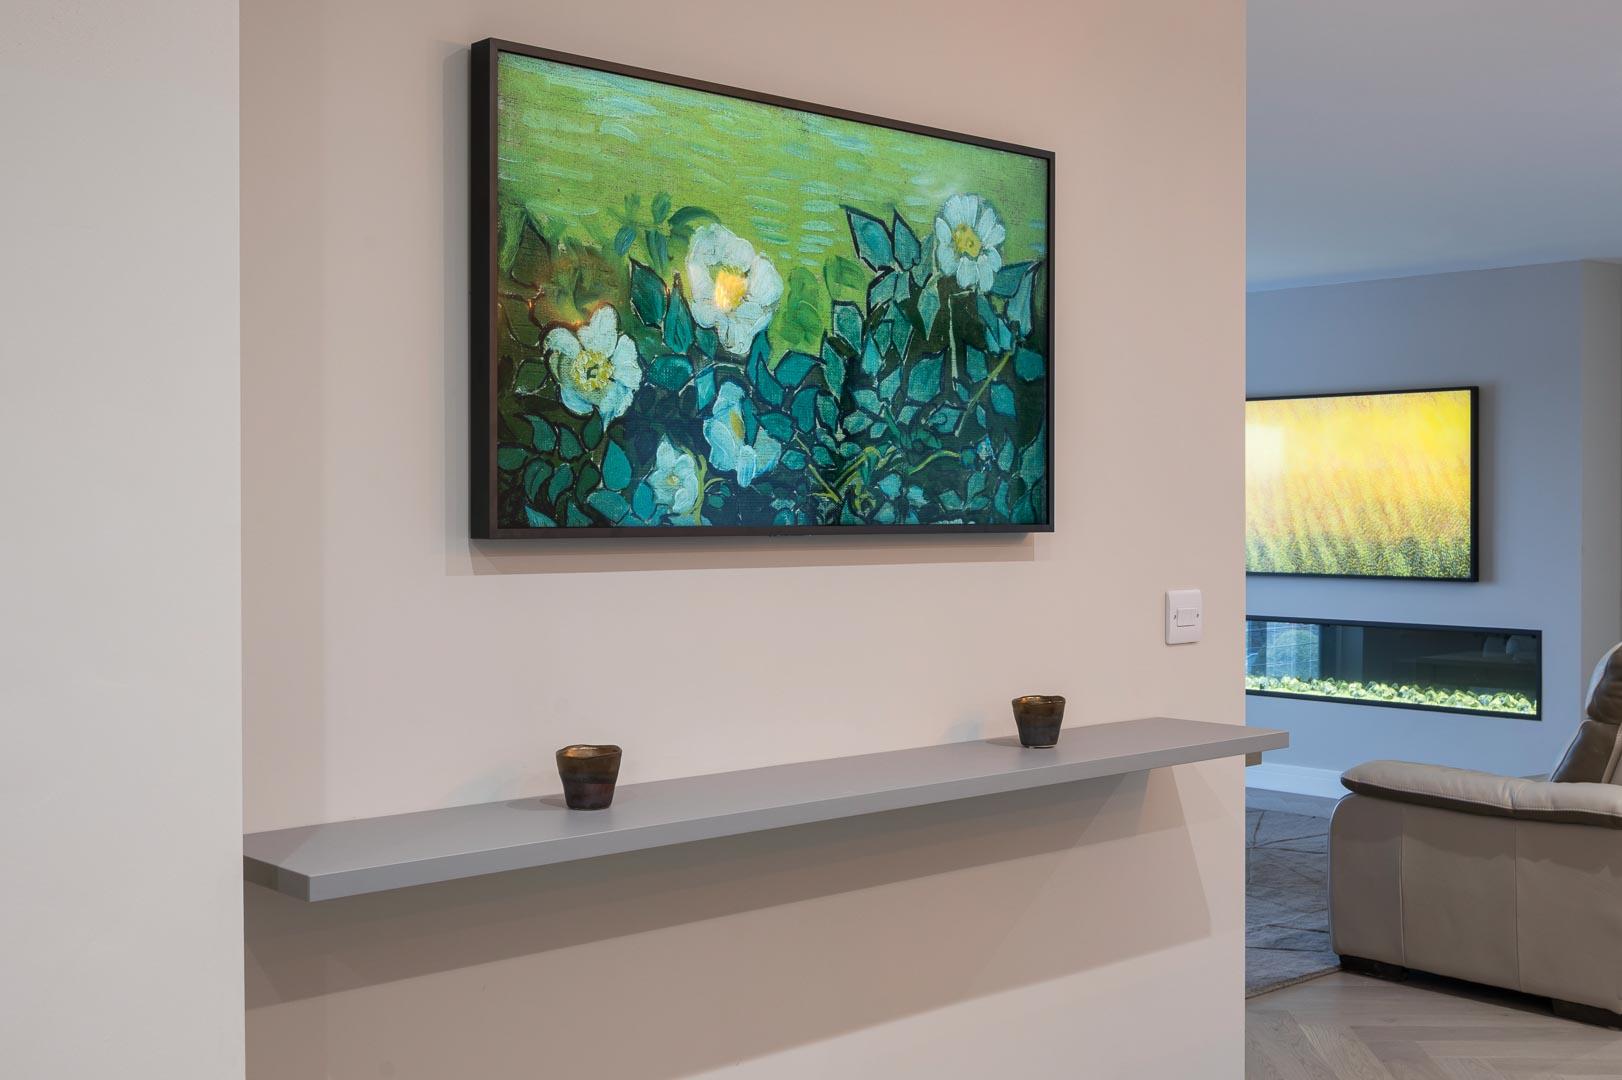 smart TV frame art qled